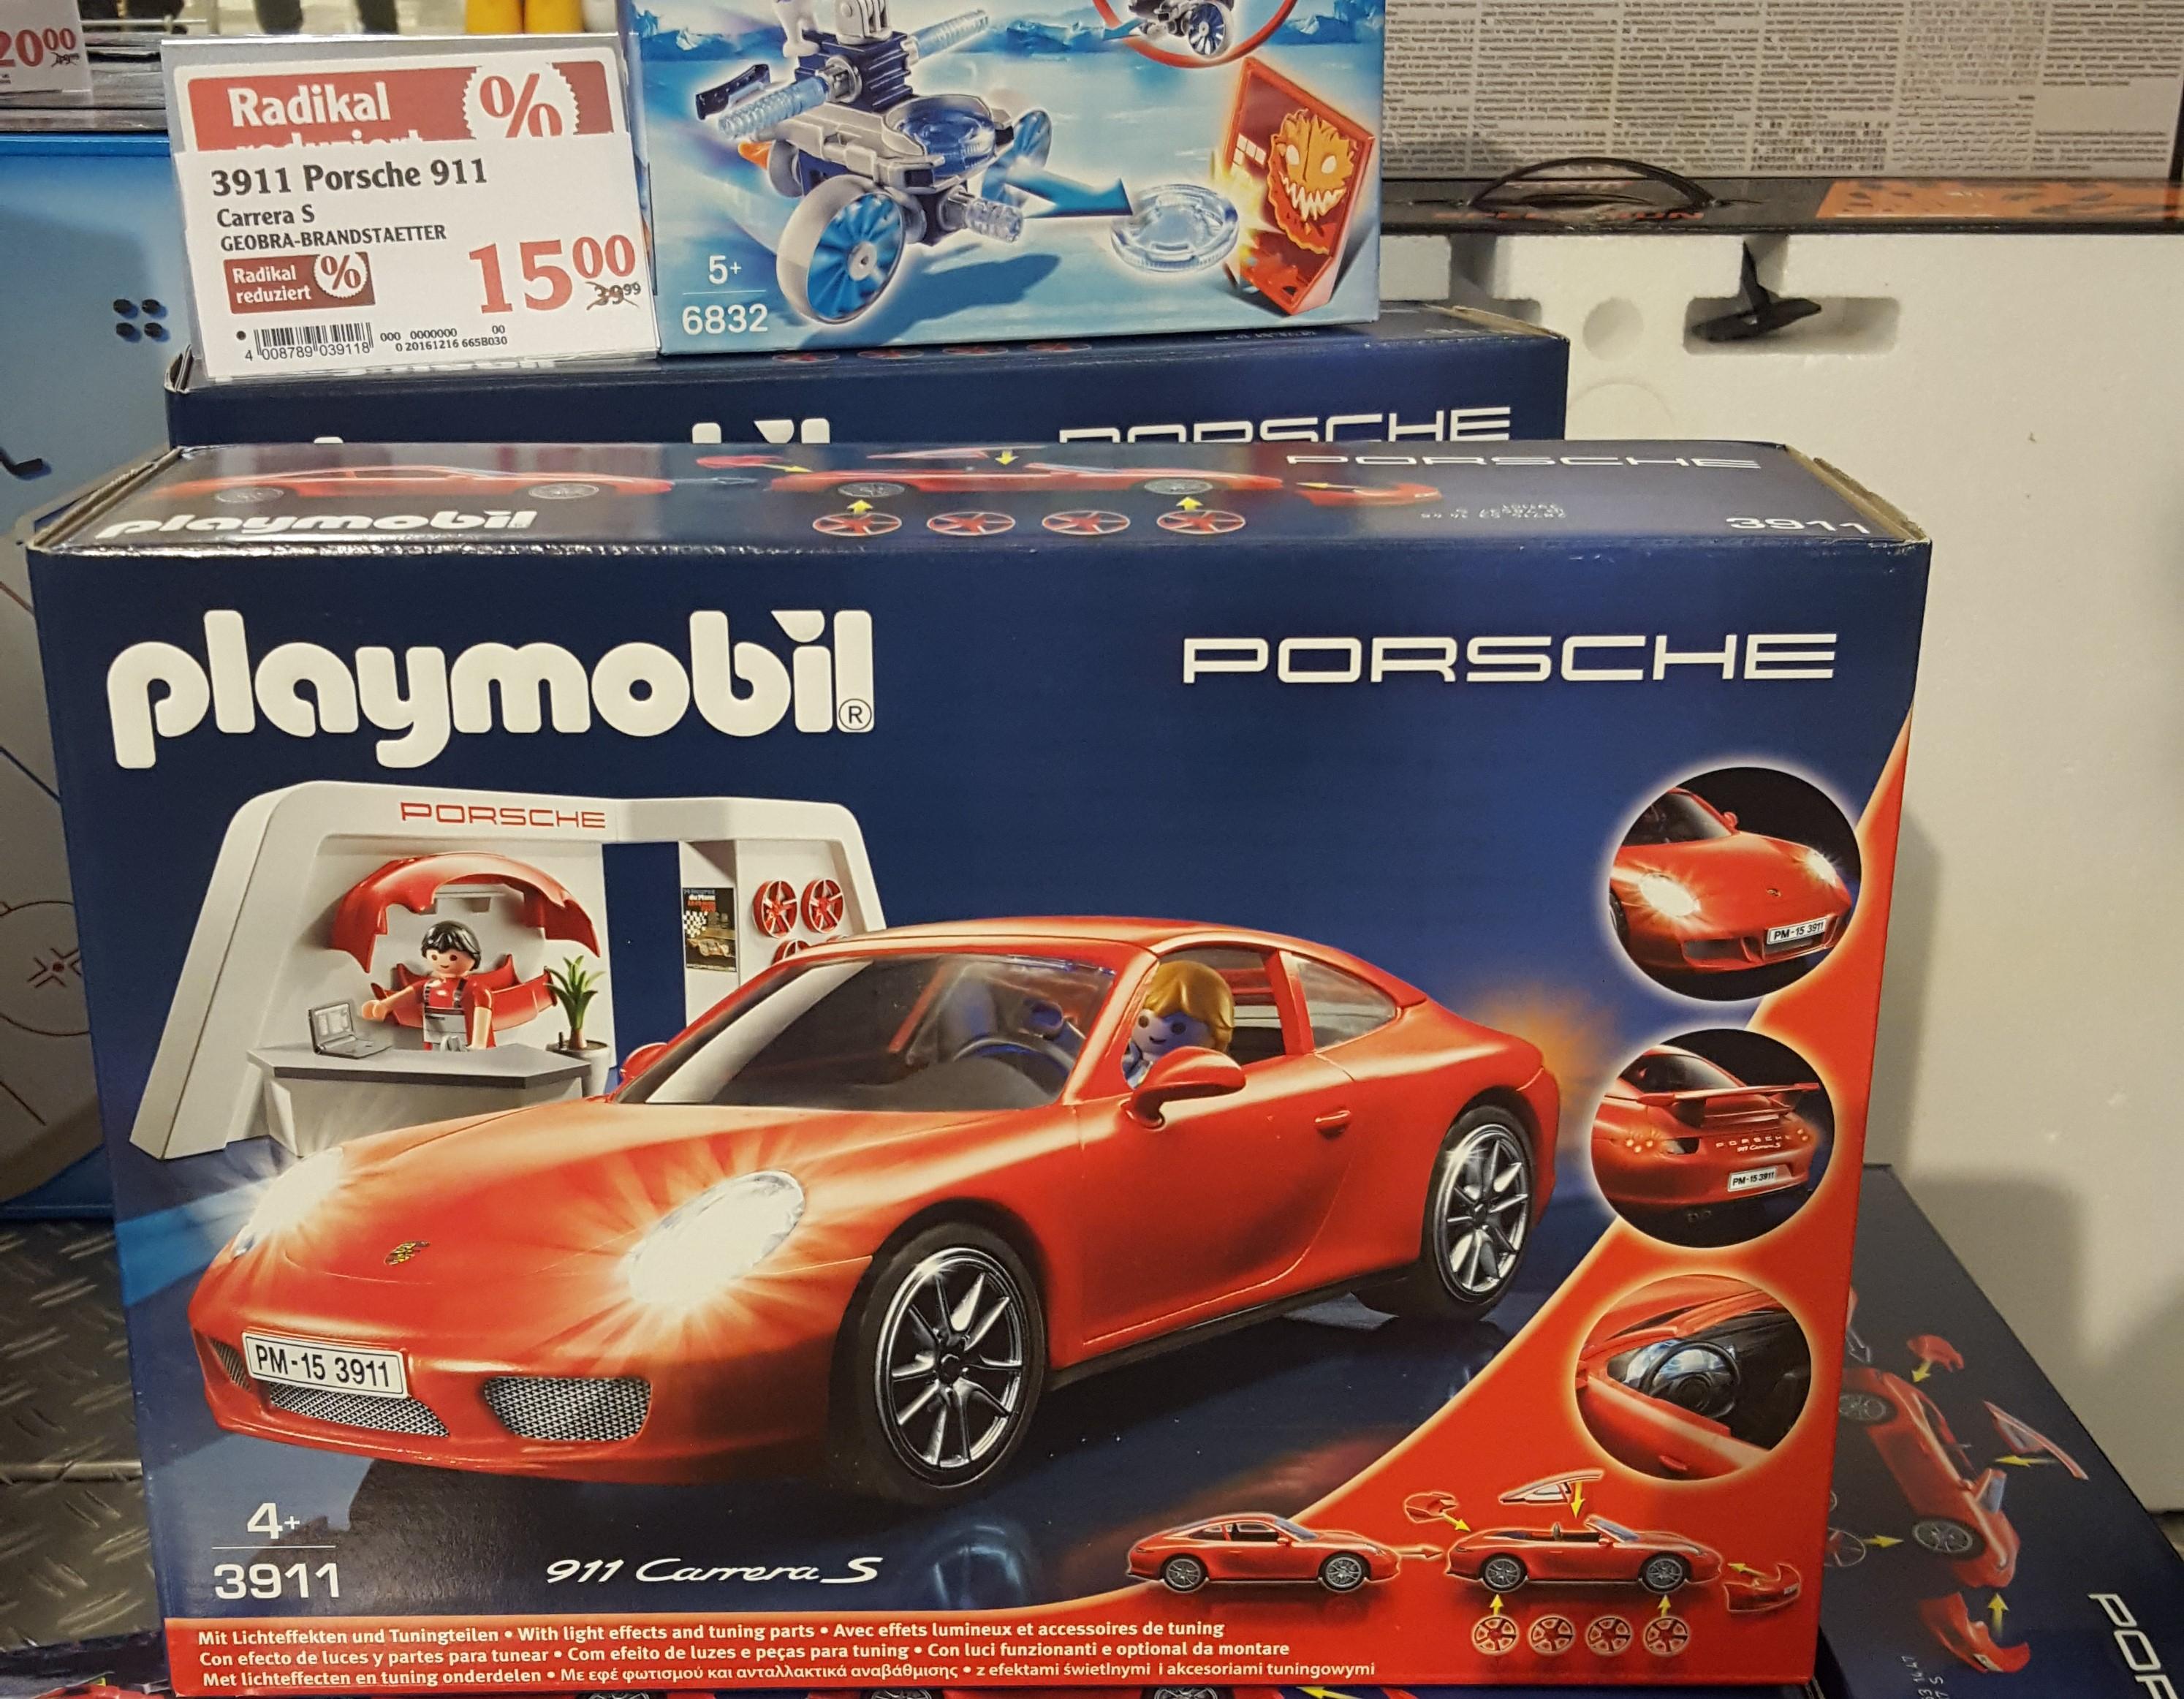 Playmobil Porsche 911 Carrera S 3911 nur 15€ Globus WND